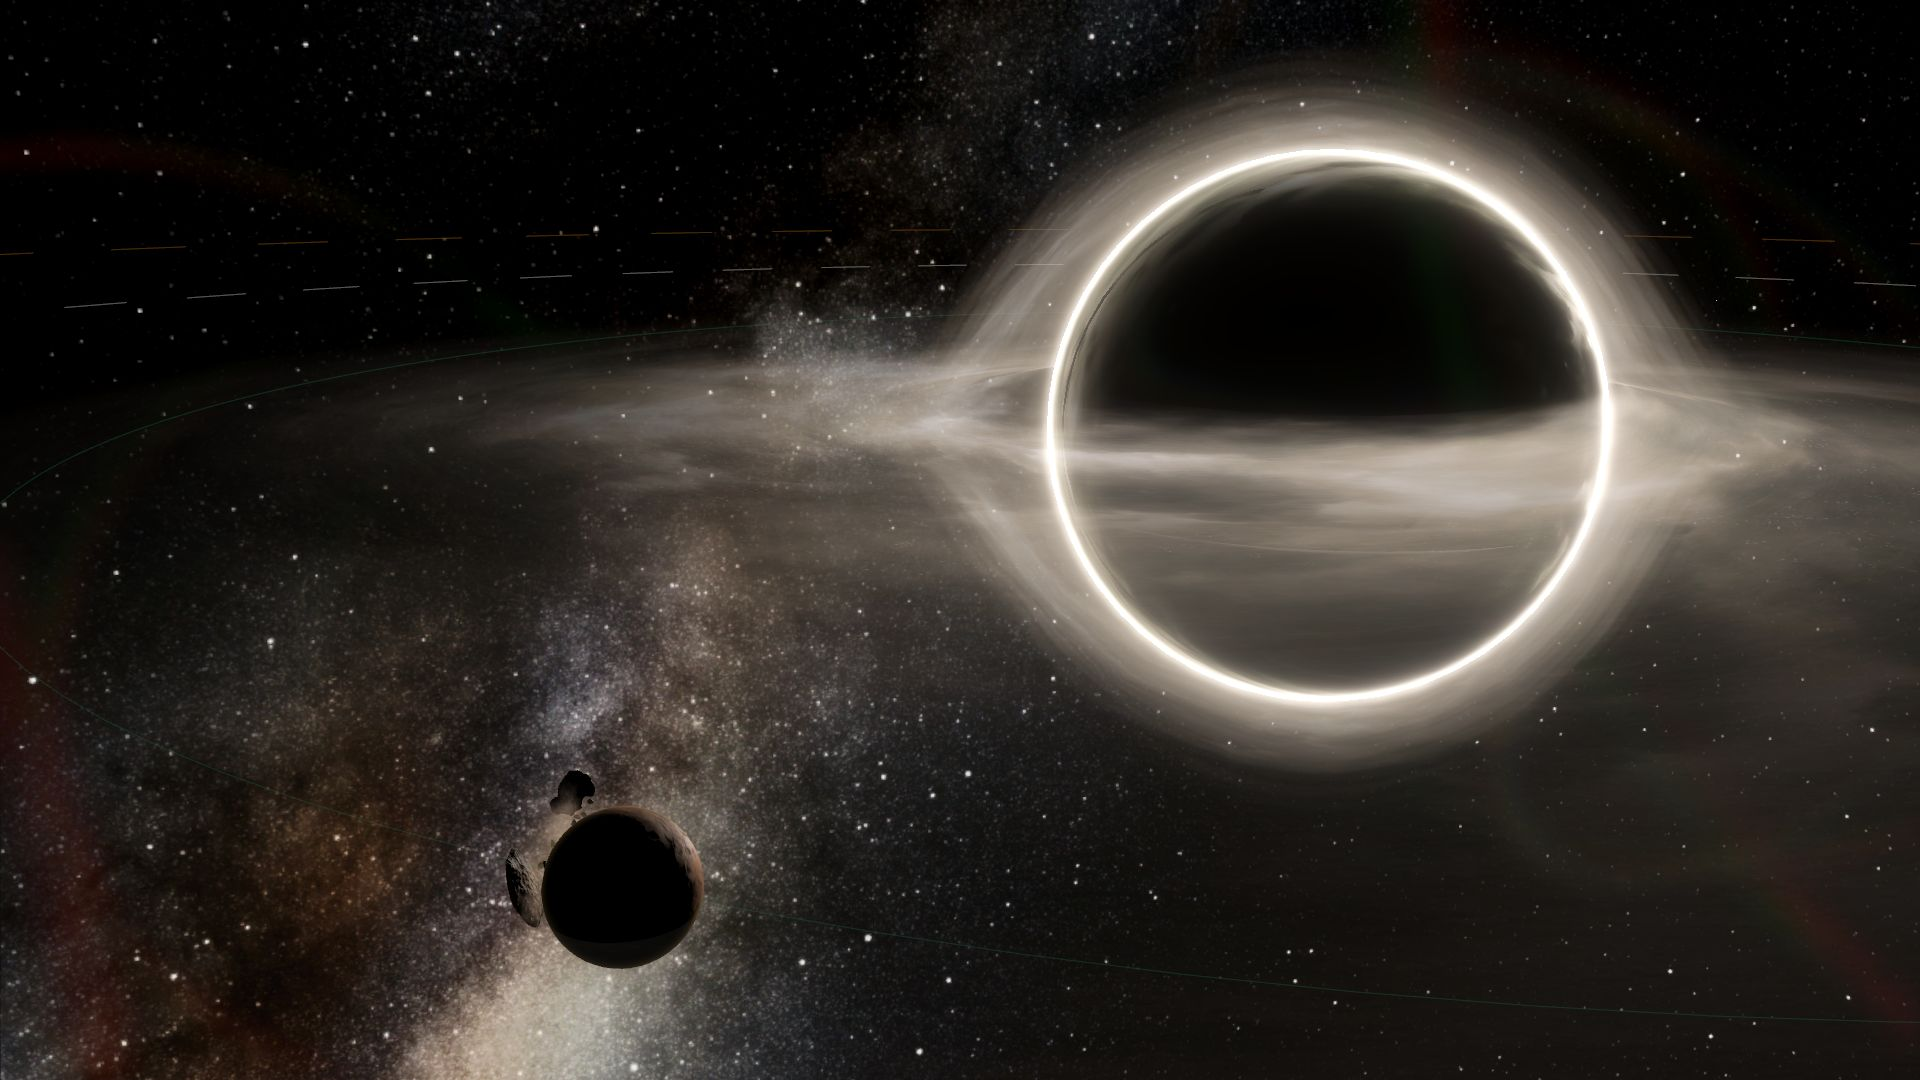 A Stellaris screenshot showing a small planet orbiting a black hole